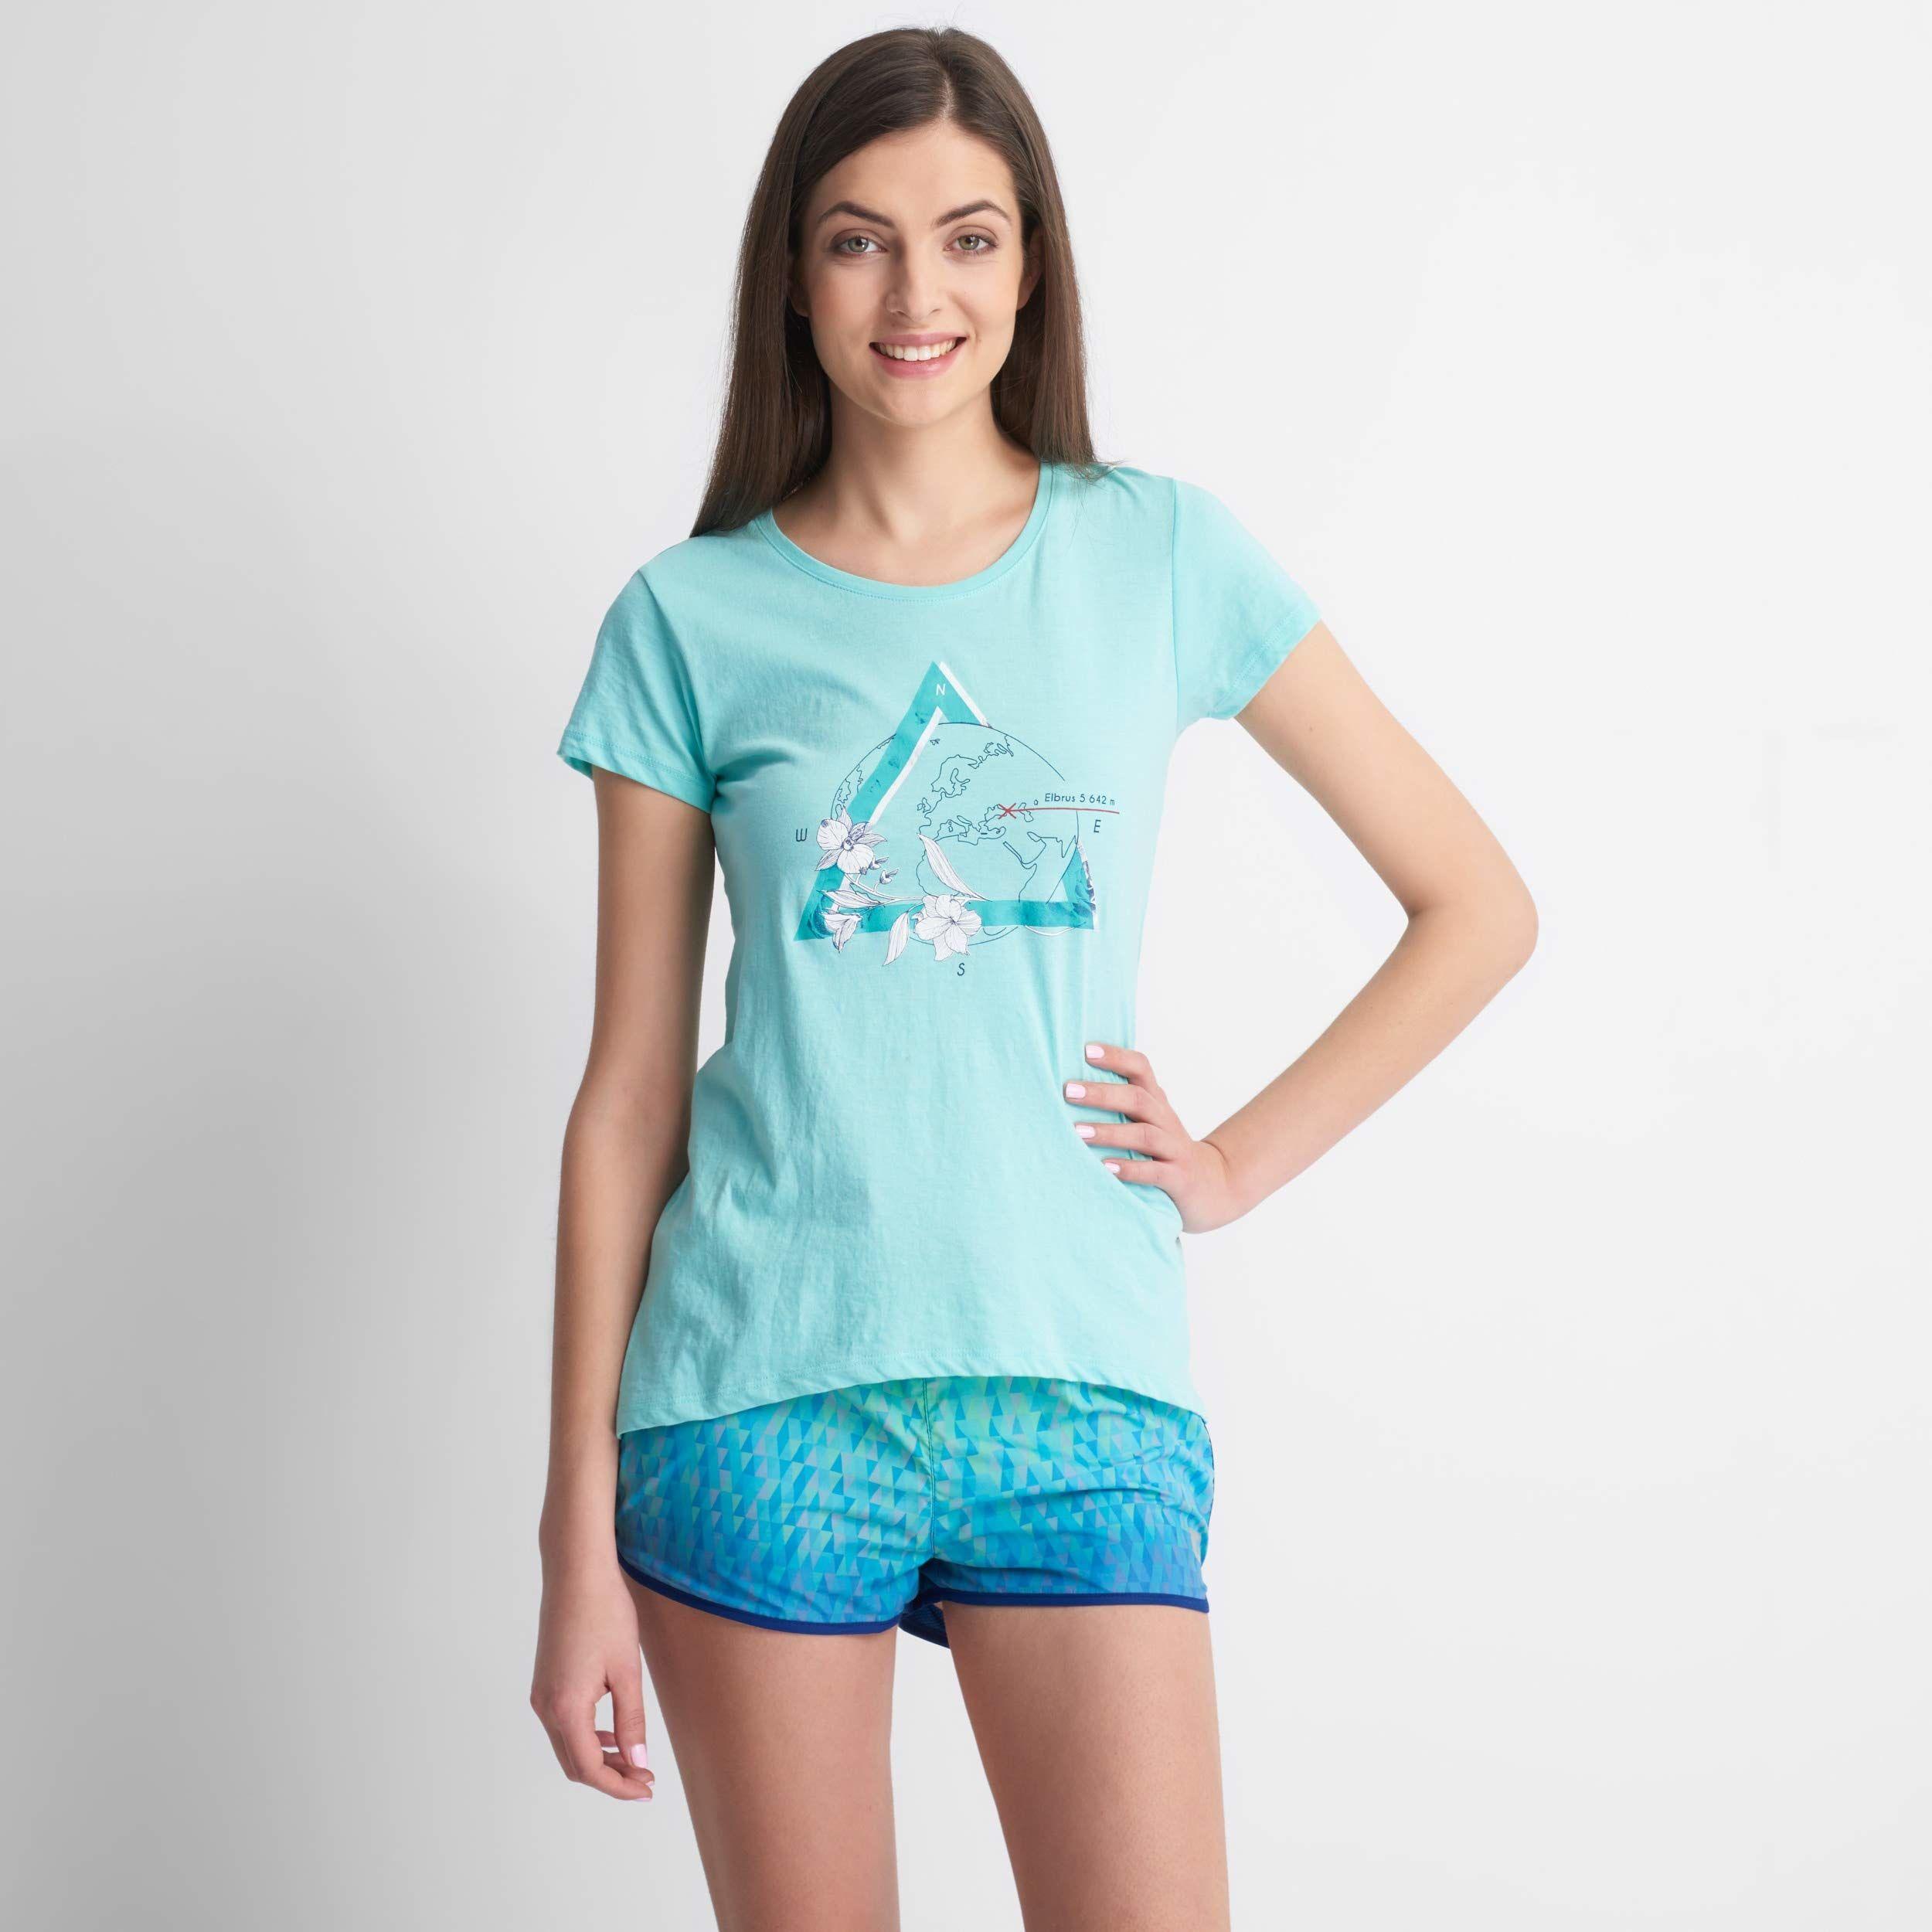 Elbrus damski T-shirt Summit Wo''s turkusowy Tanager Turquoise Melange X-S